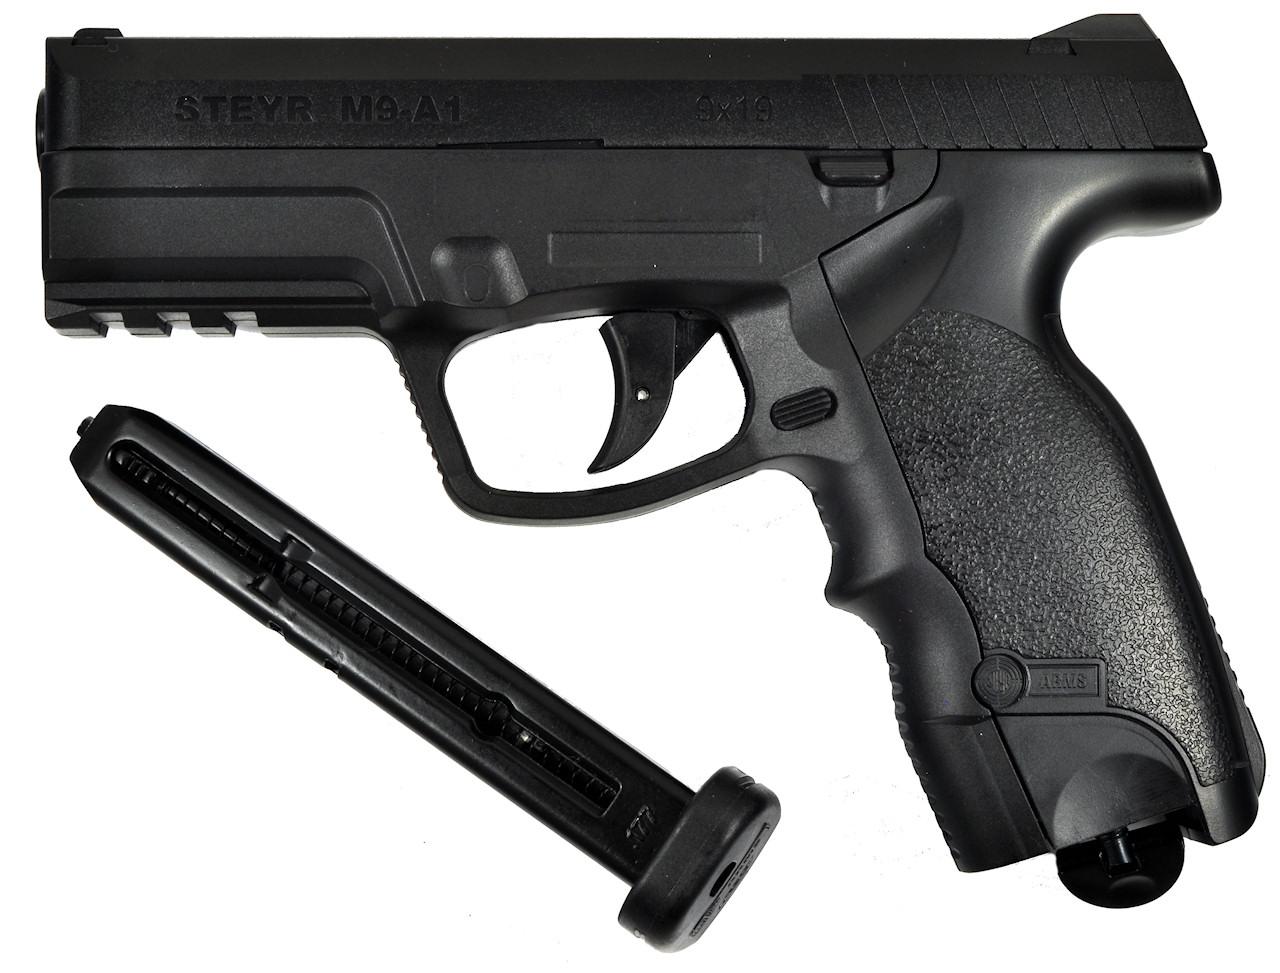 ASG MANNLICHER STEYR M9 A-1 4 5mm STEEL BALL CO2 GAS GUN NON-BLOWBACK